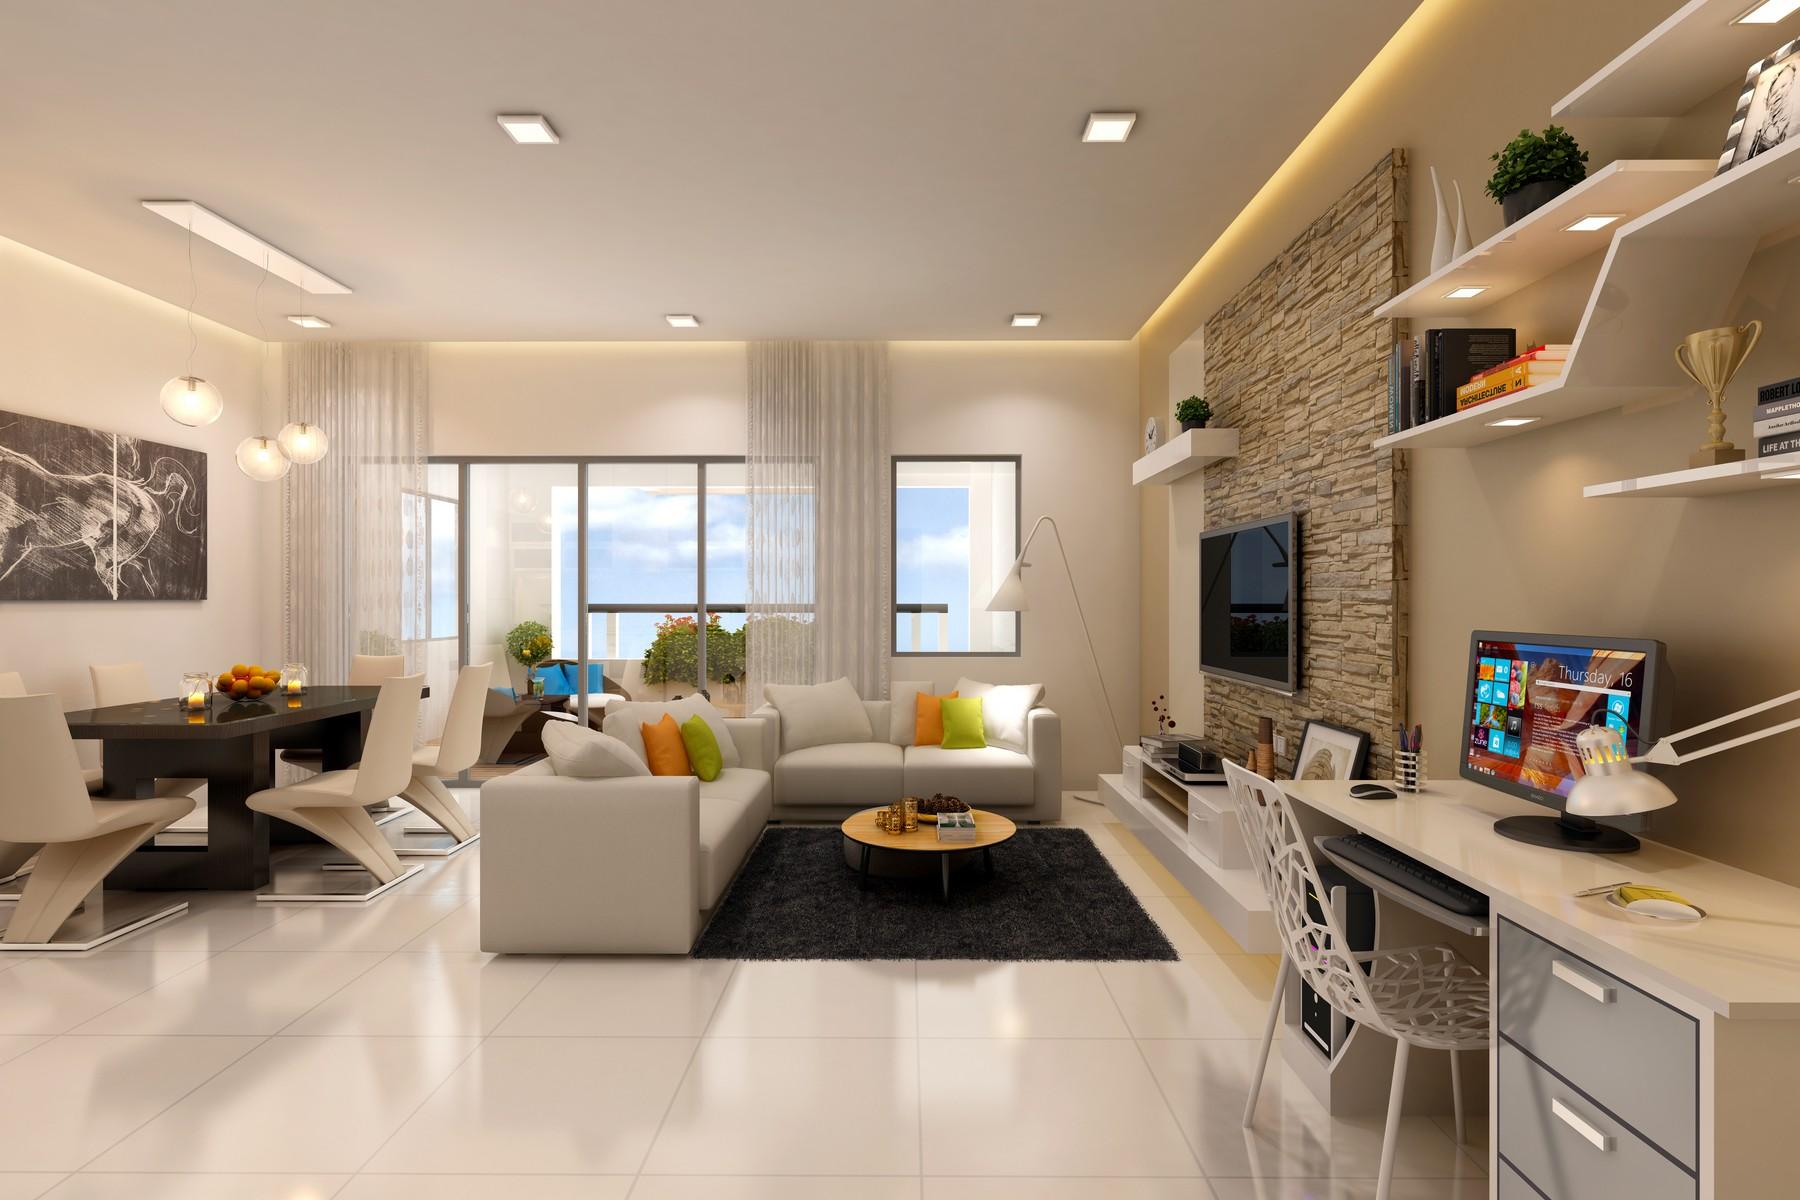 Apartment for Sale at Villanessa - Apartments Grand Baie, Riviere Du Rempart Mauritius